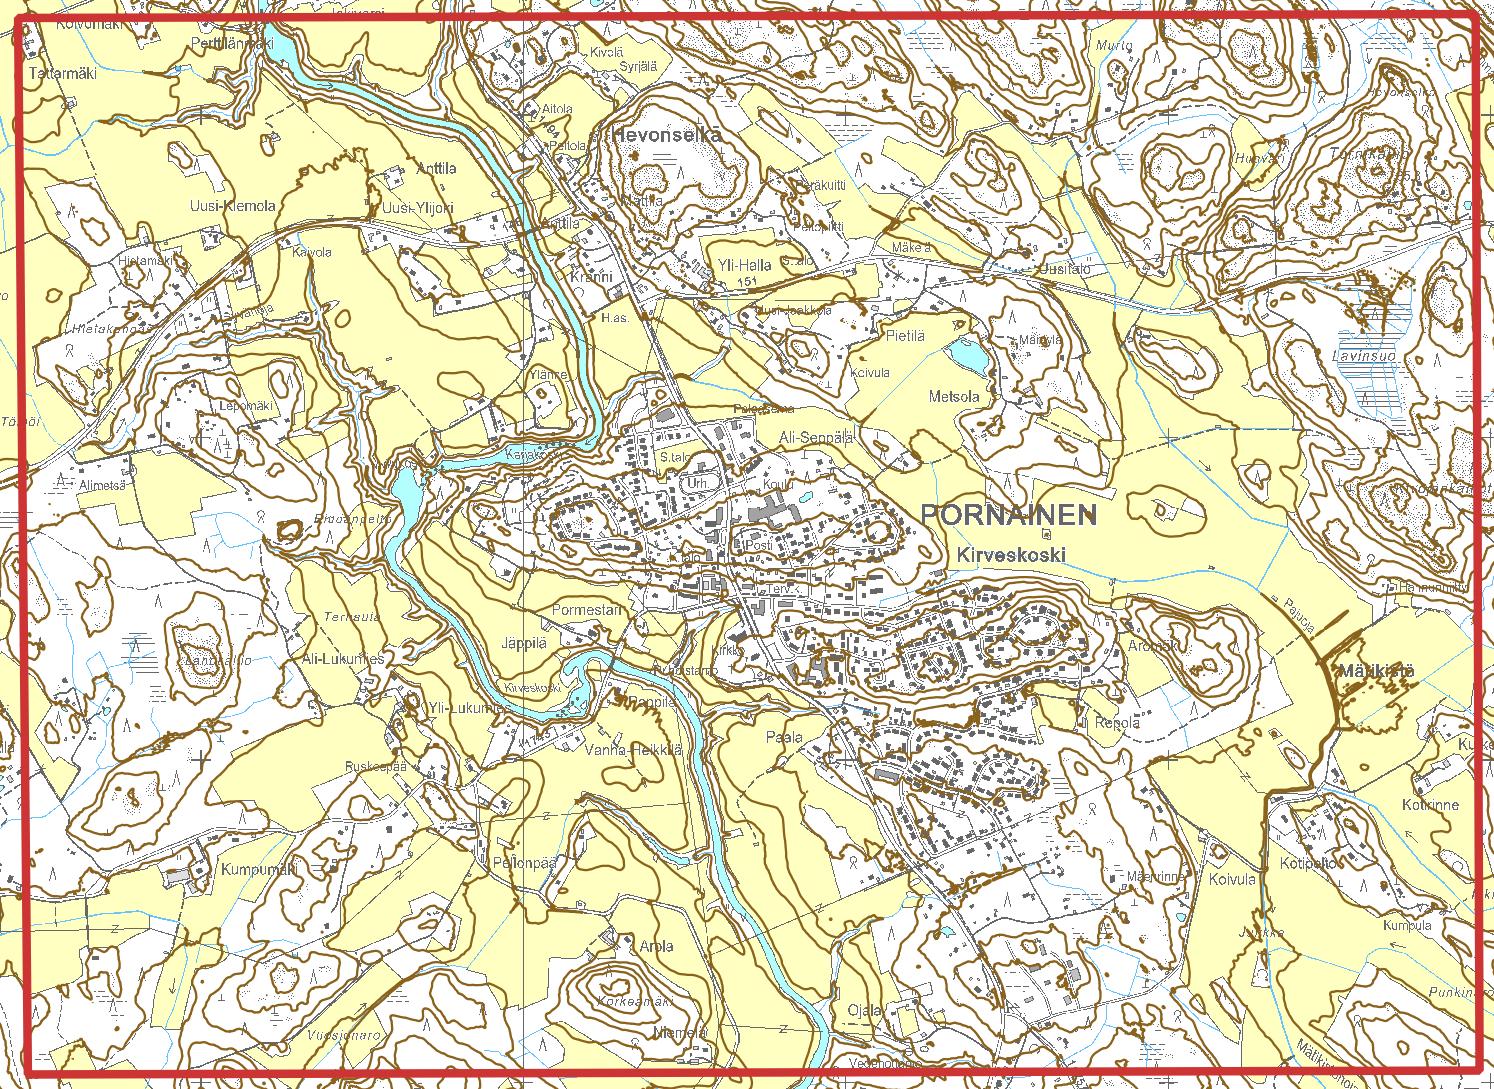 Kuva 5. QGIS:ssa tehdyt korkeuskäyrät